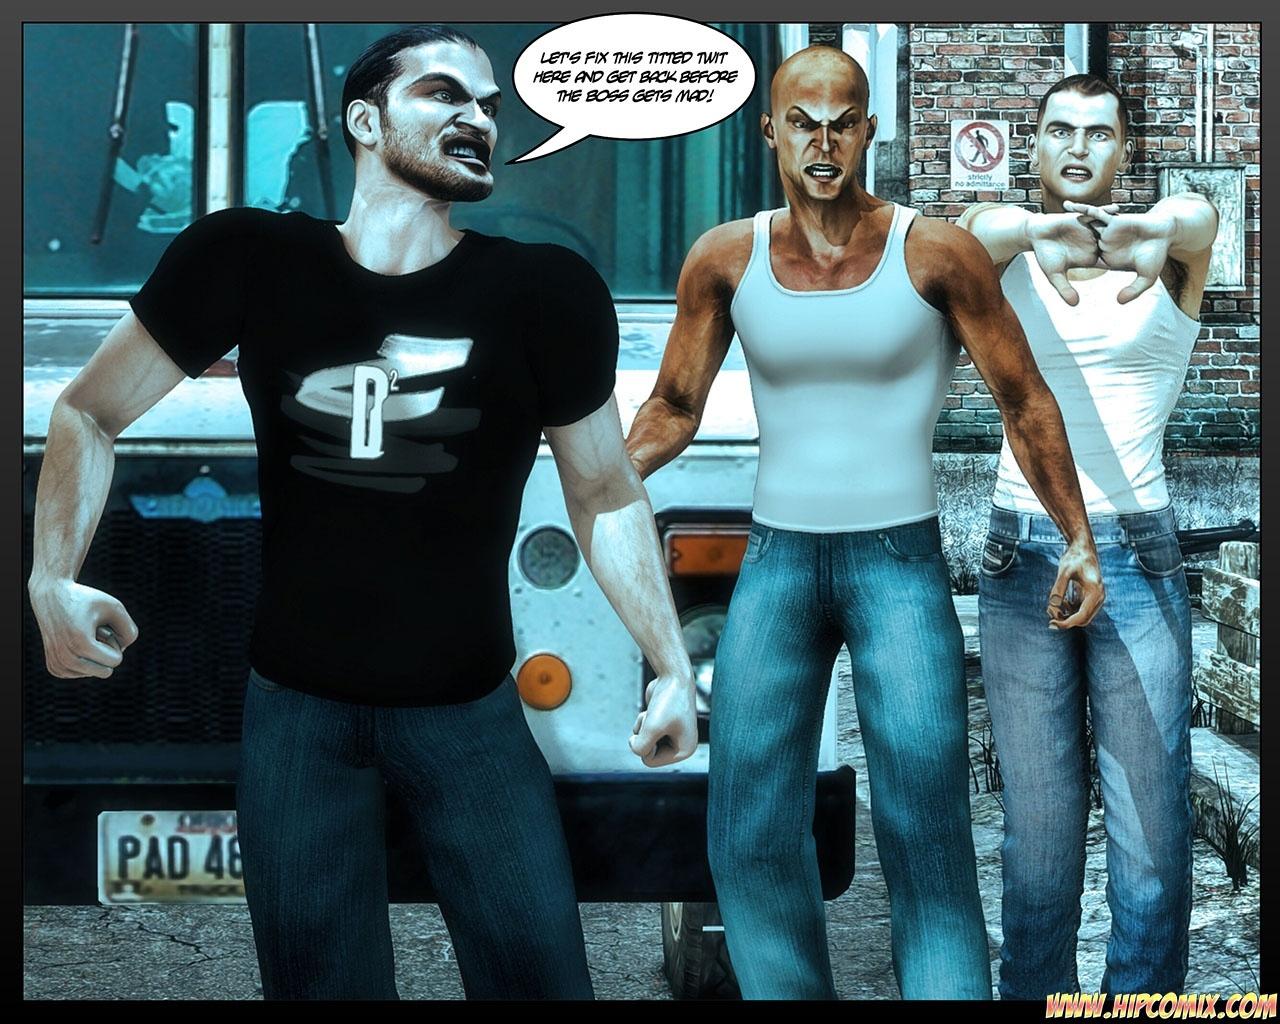 Panther-Girl-13 9 free sex comic